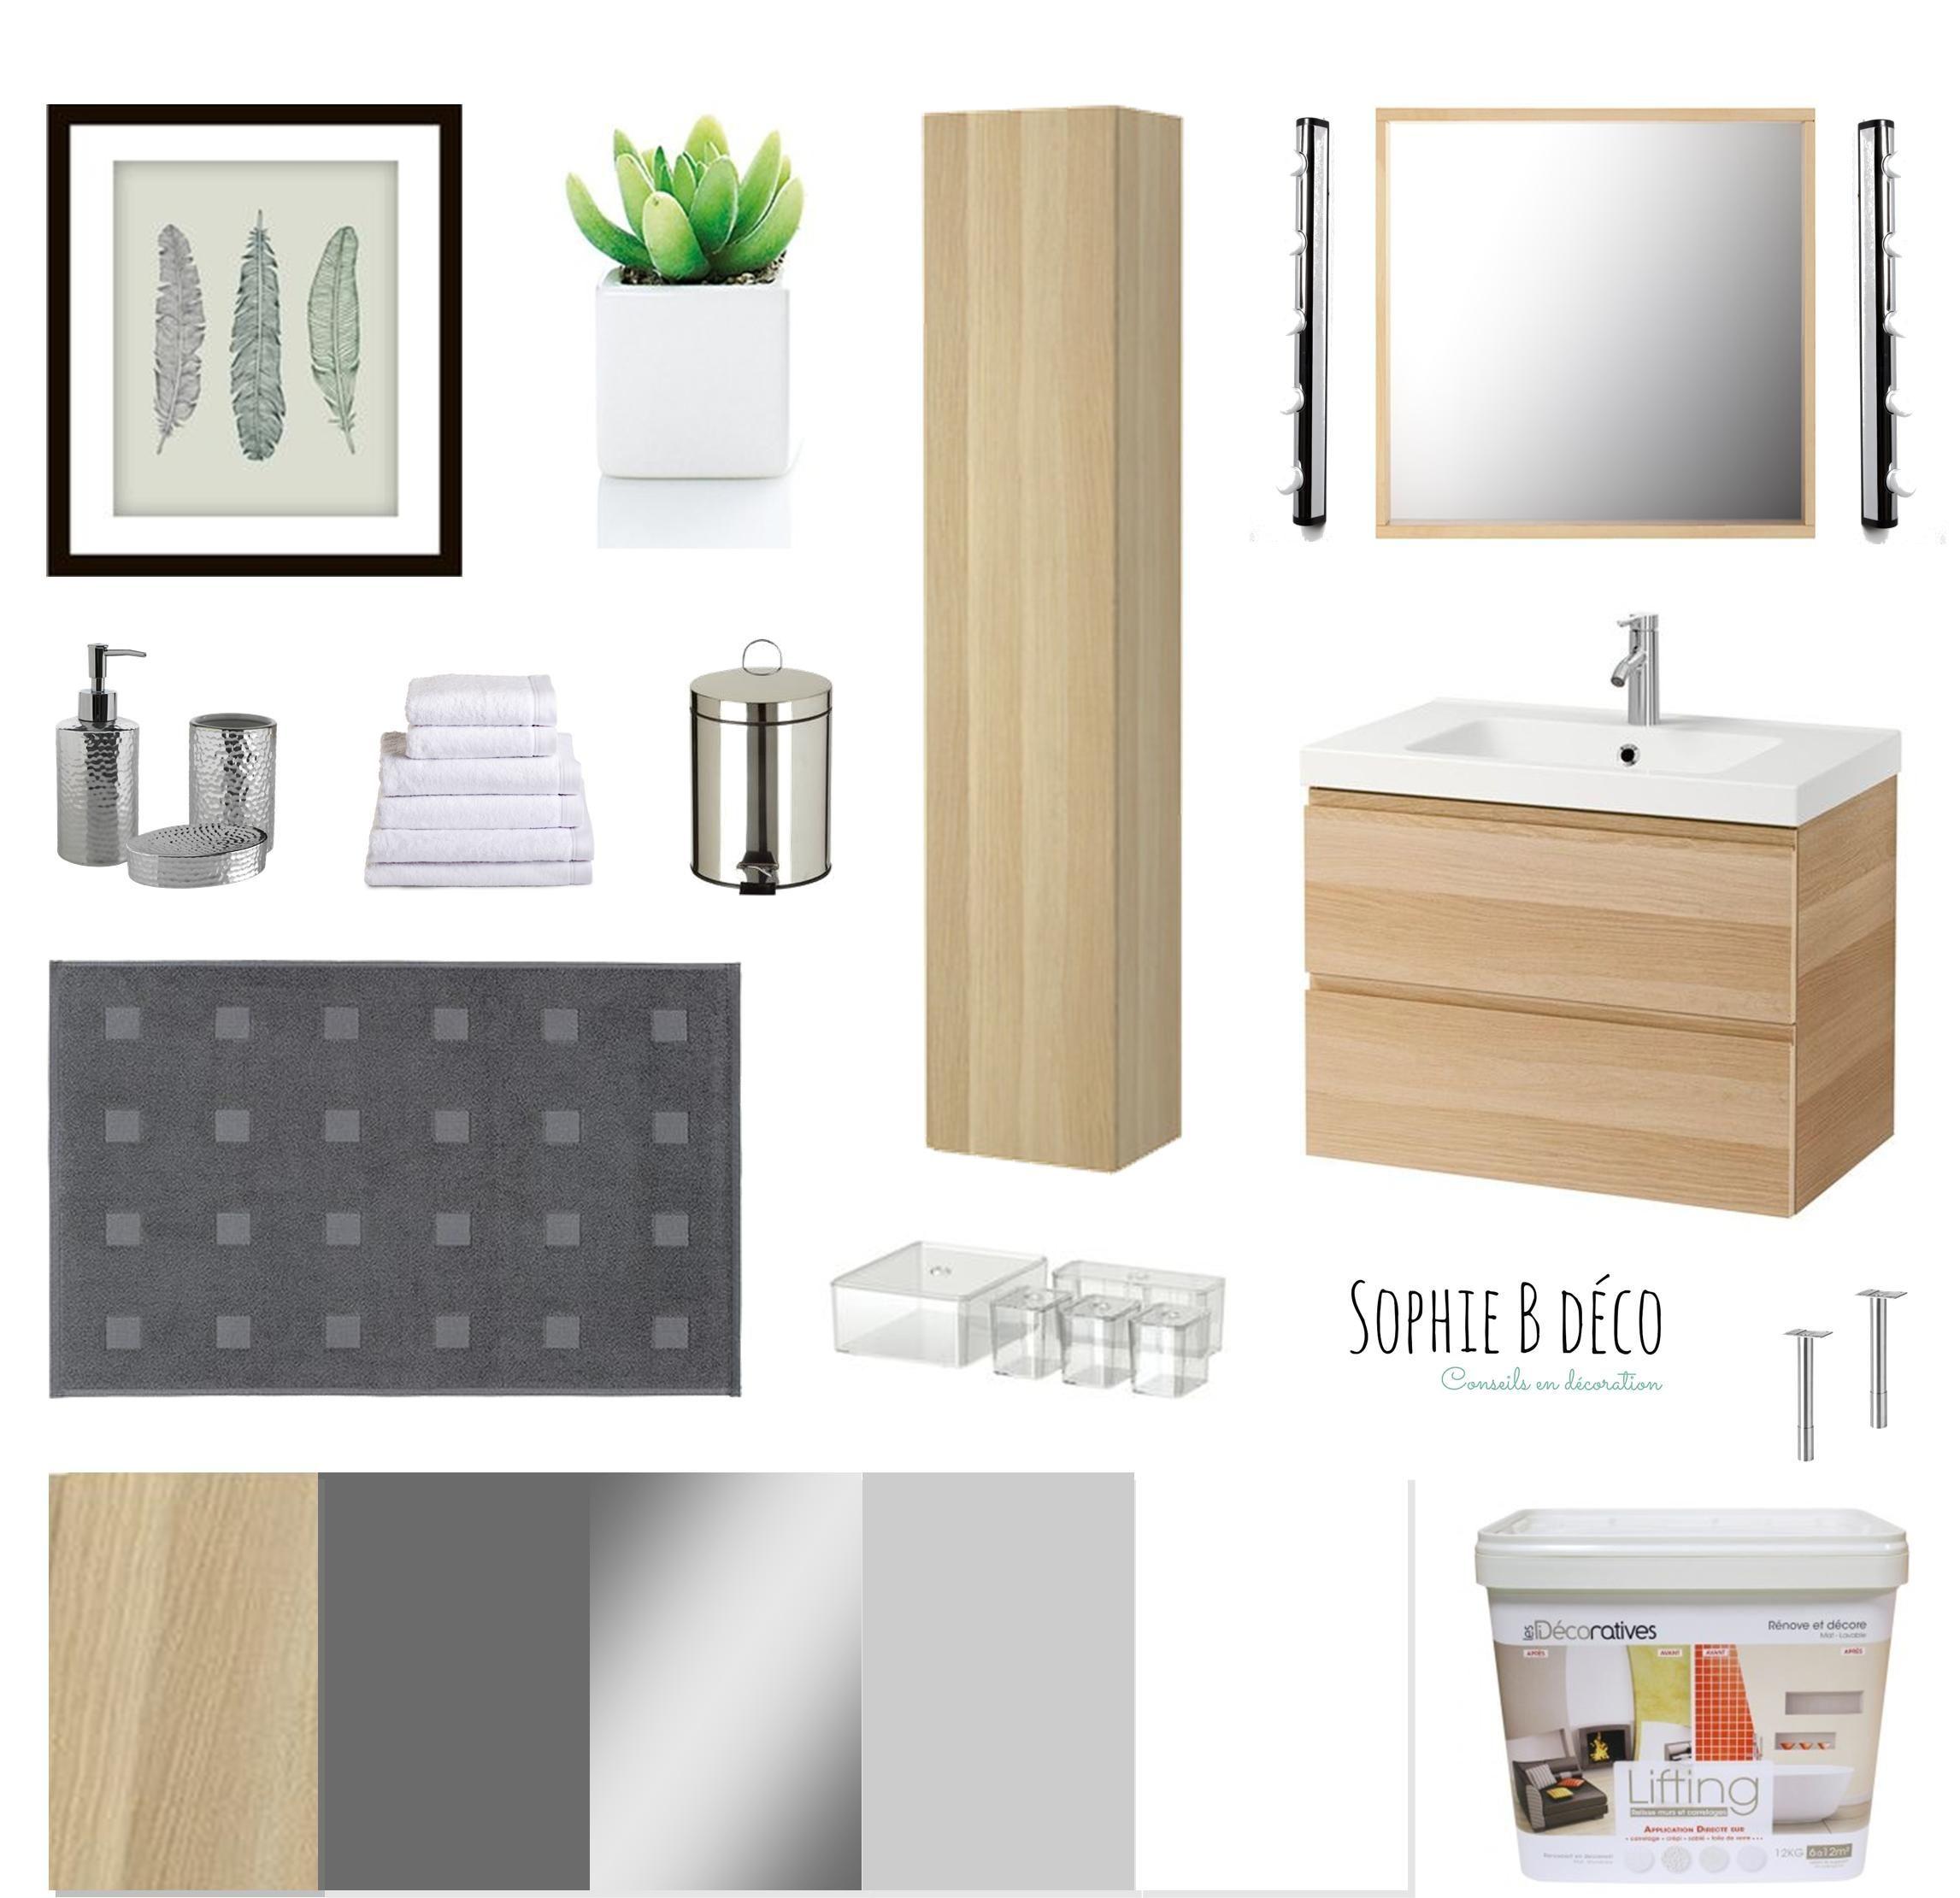 Bain Blanc Bois Godmorgon Gris Ikea Leroy Planche Renovation Salle Shopping Planche Shopp In 2020 Bathrooms Remodel Home Remodeling Bathroom Interior Design